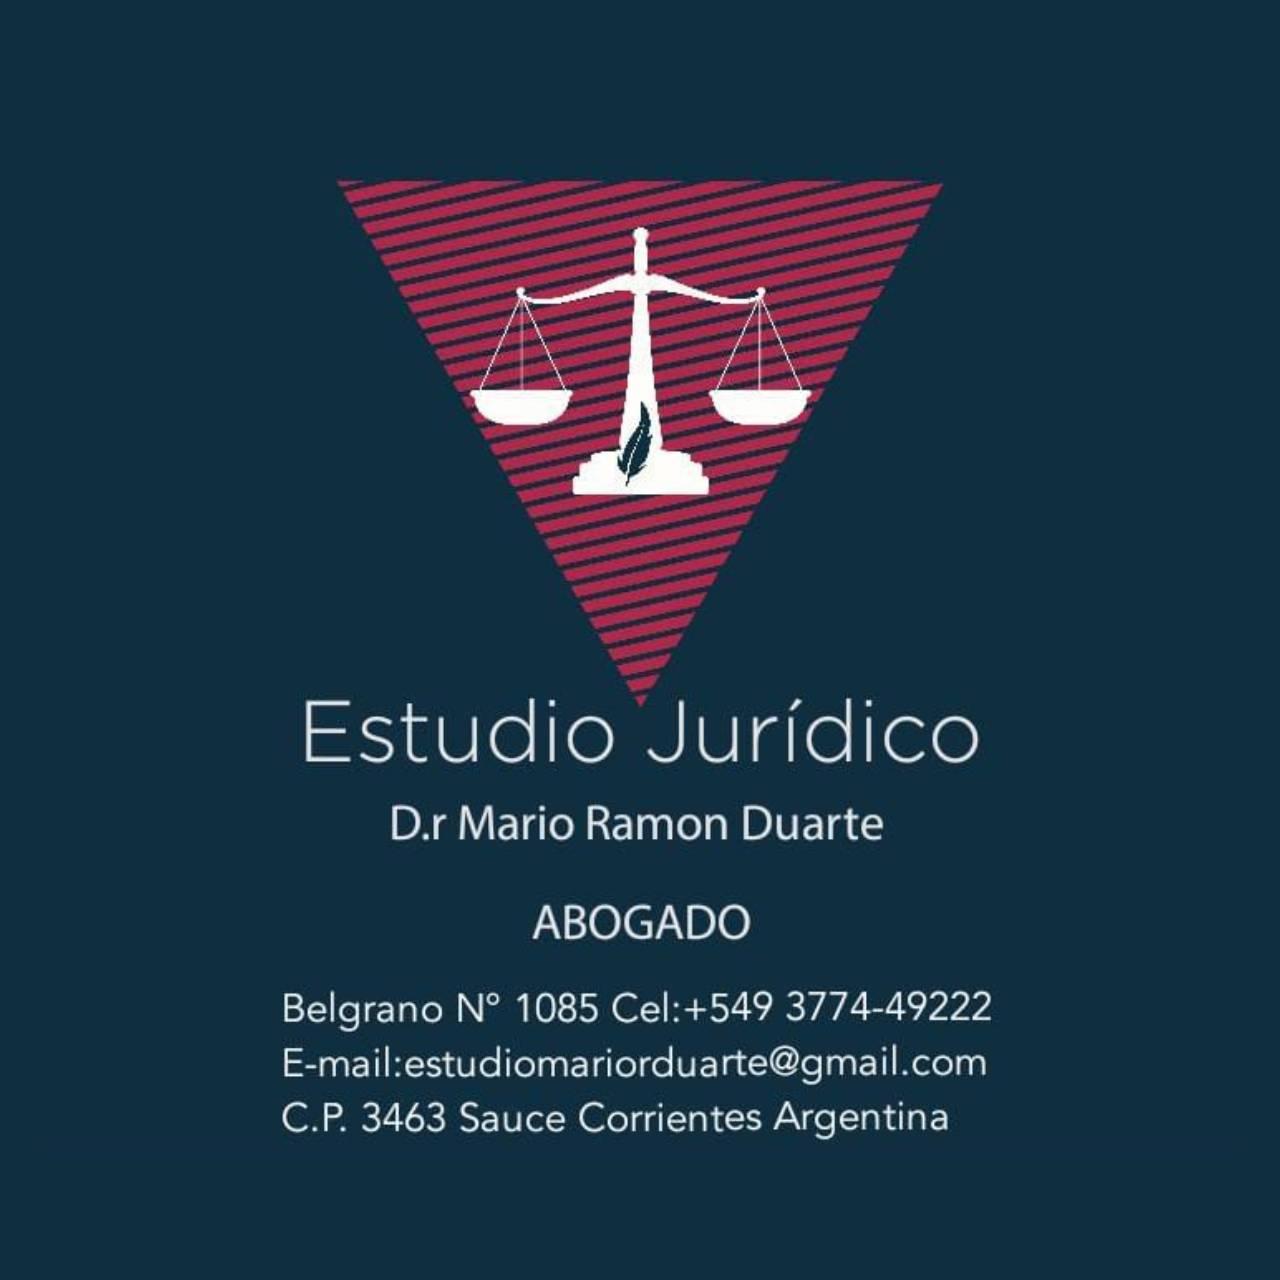 Estudio Jurídico Mario Ramón Duarte